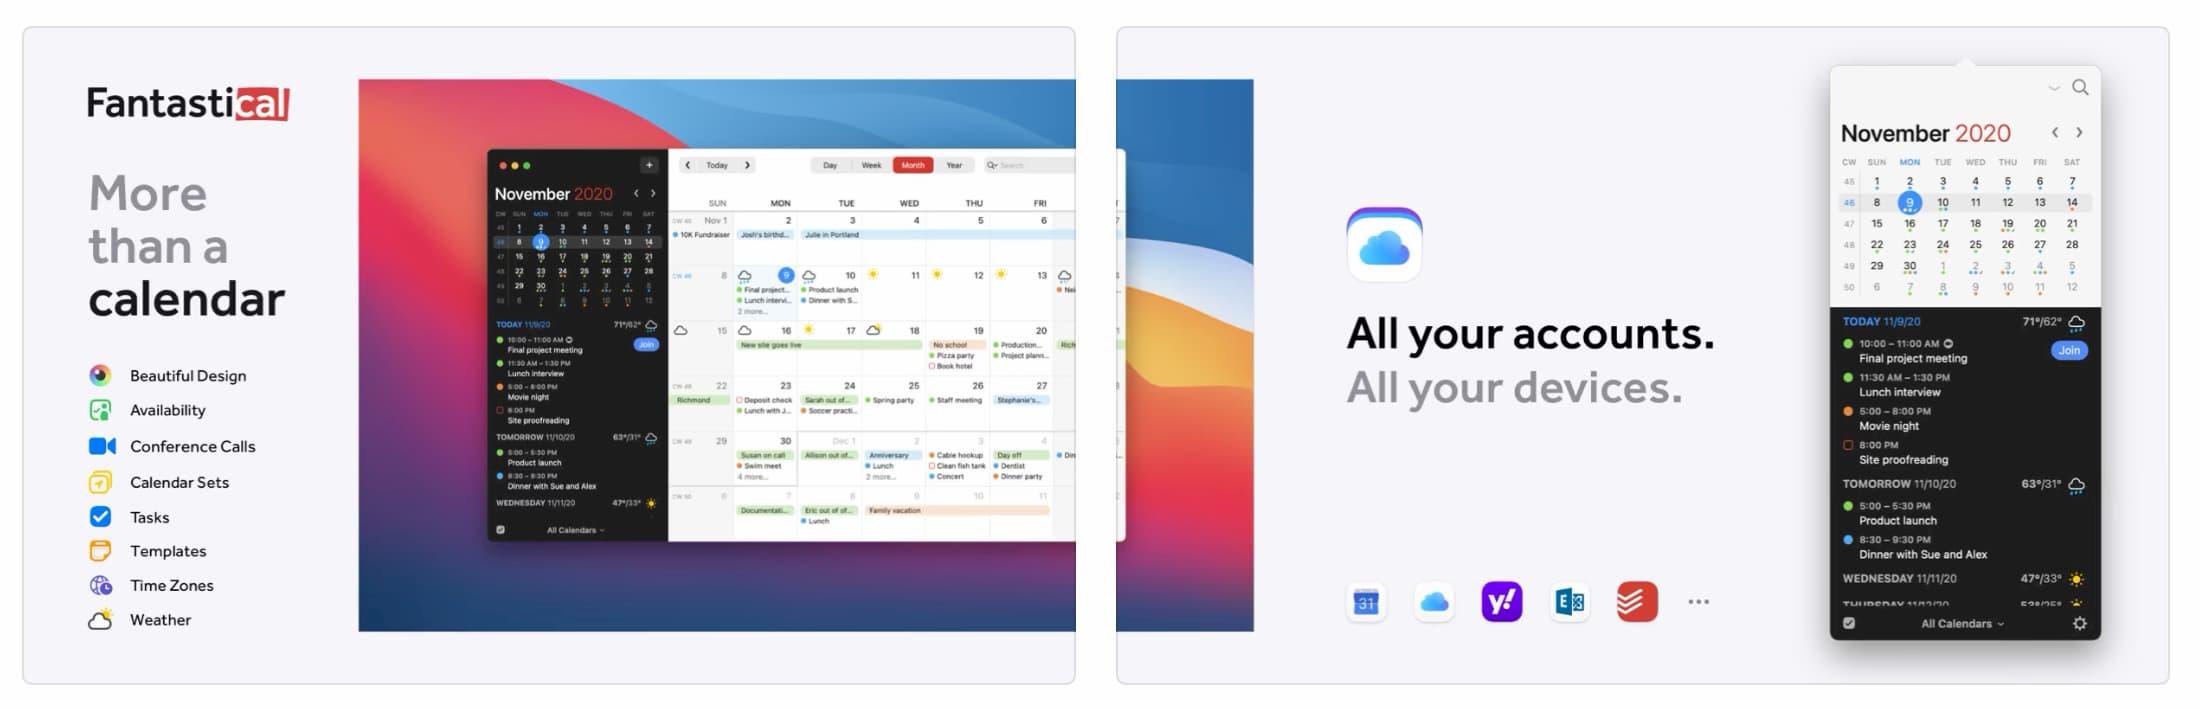 App Store 2020 年度最佳遊戲與 App 出爐!一起來看有哪些